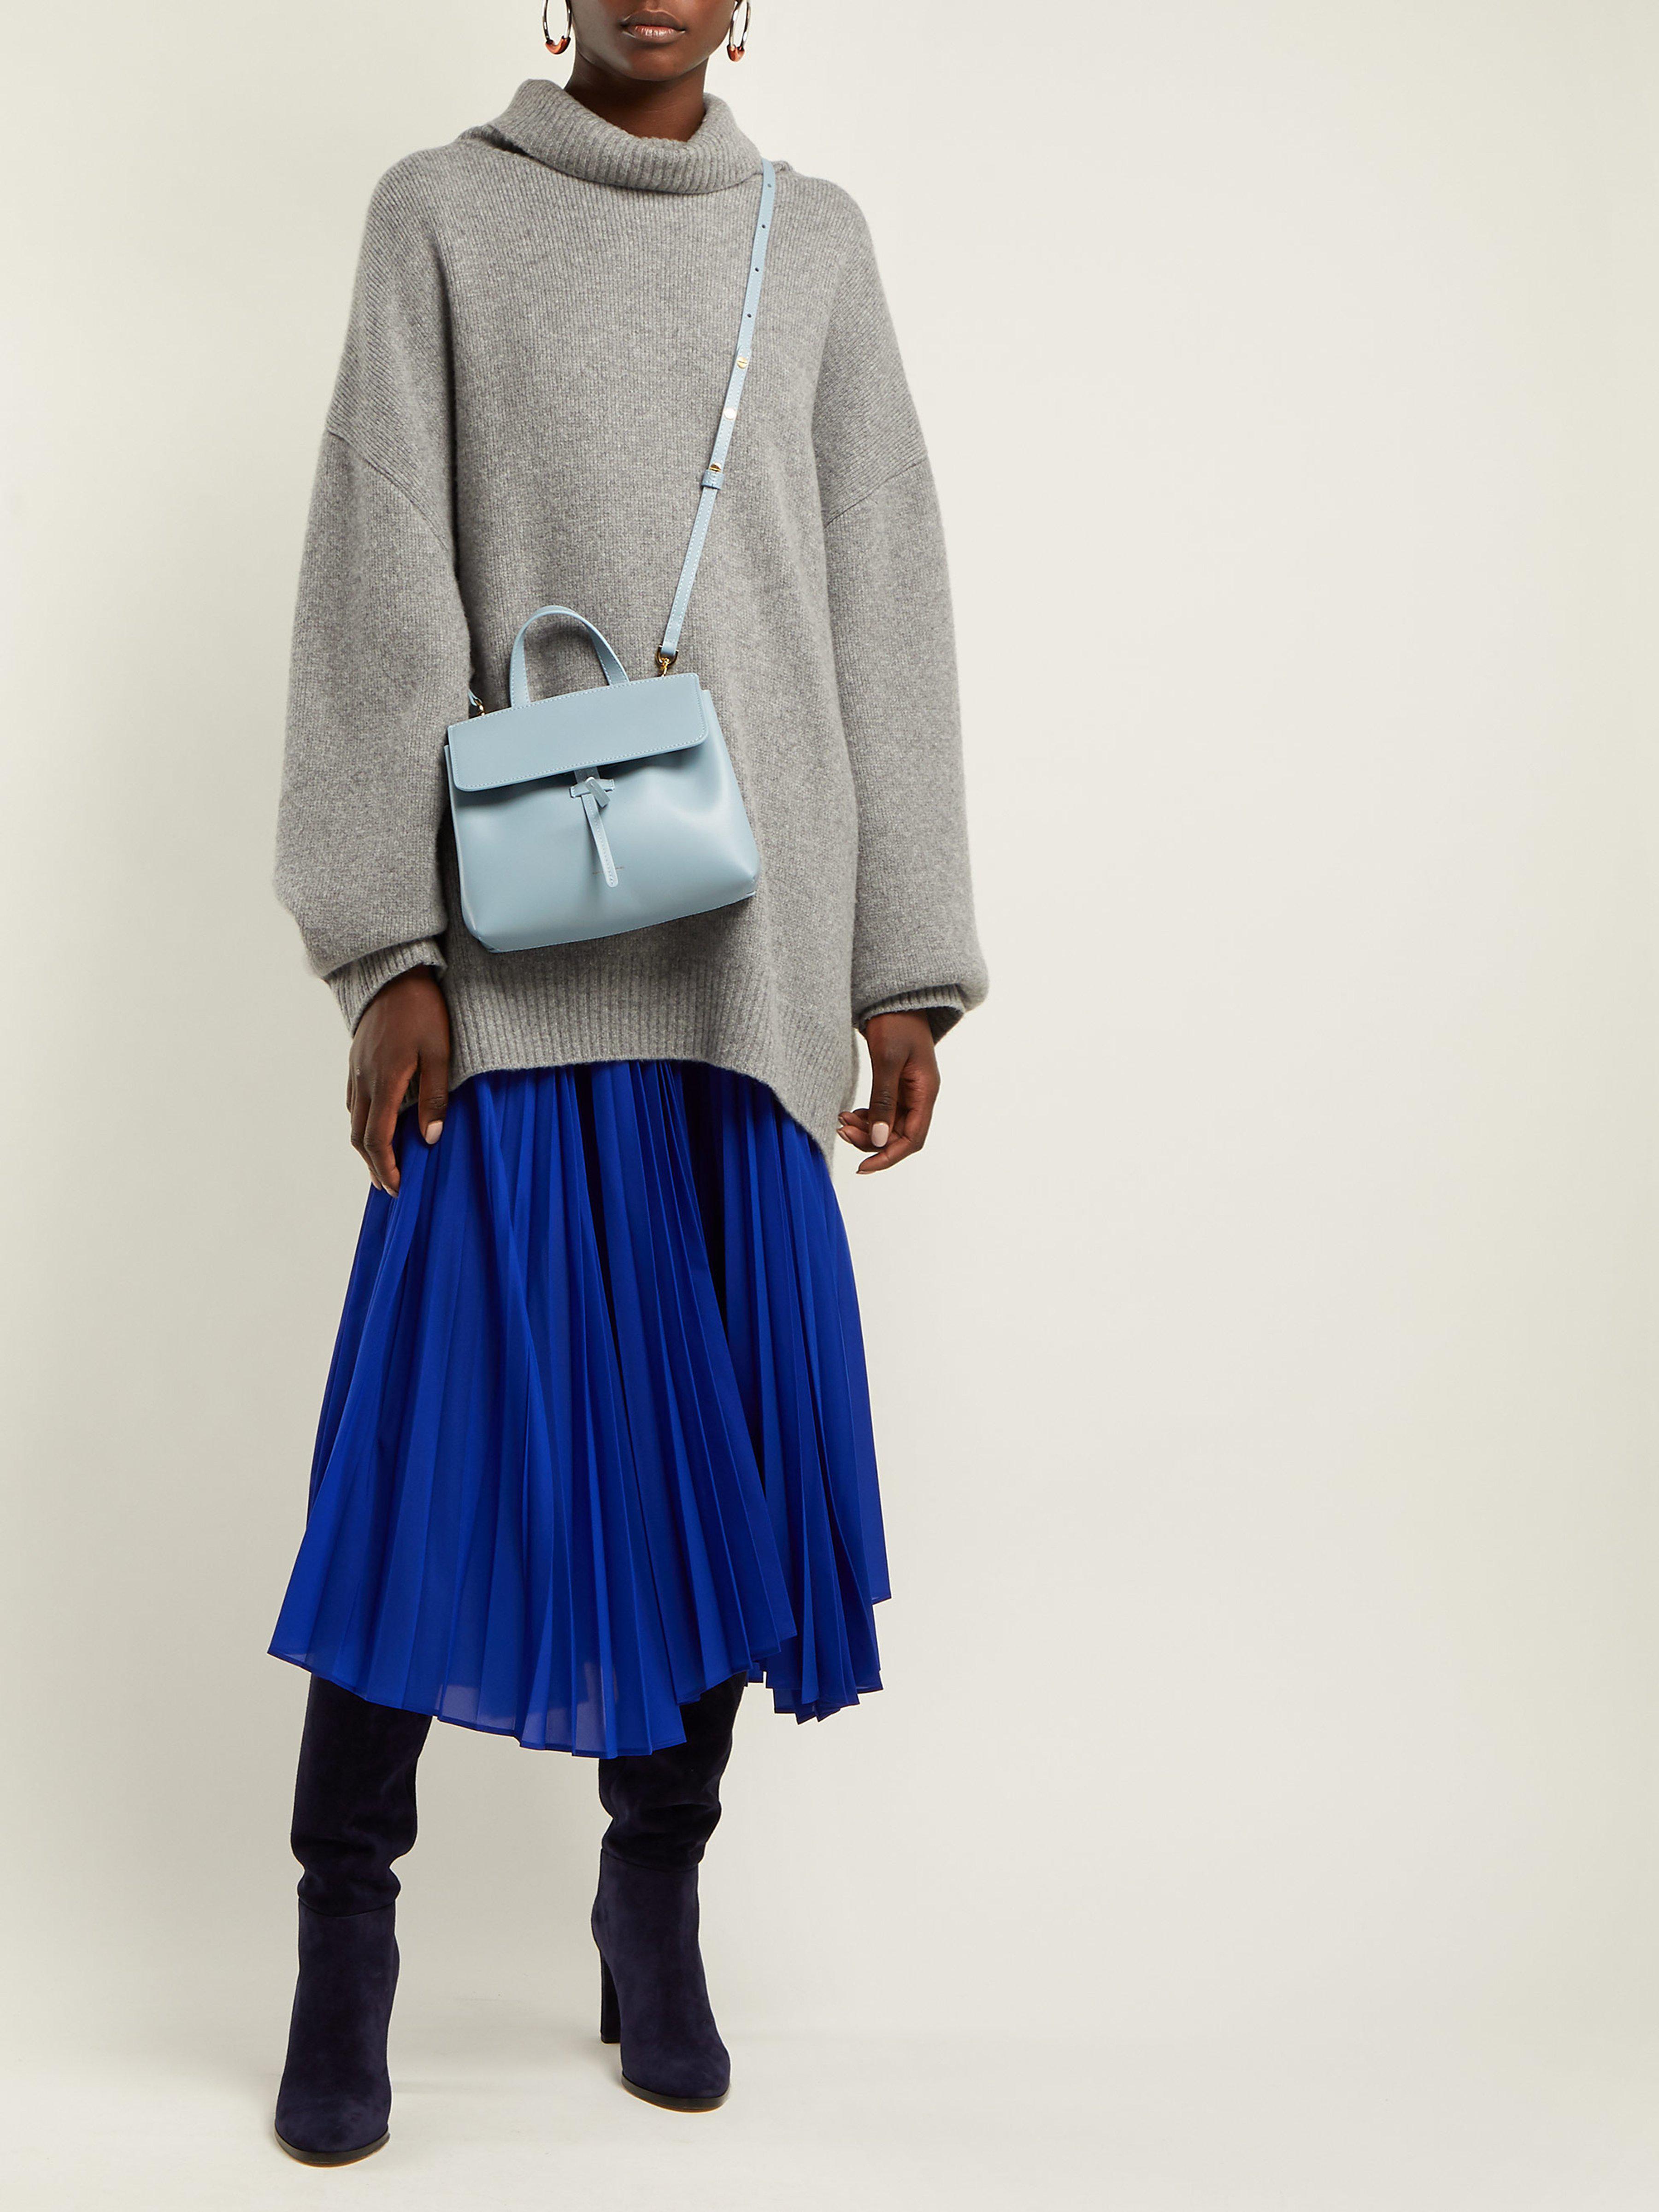 57ed8cd6e95 Mansur Gavriel Gray Mini Mini Lady Leather Cross Body Bag